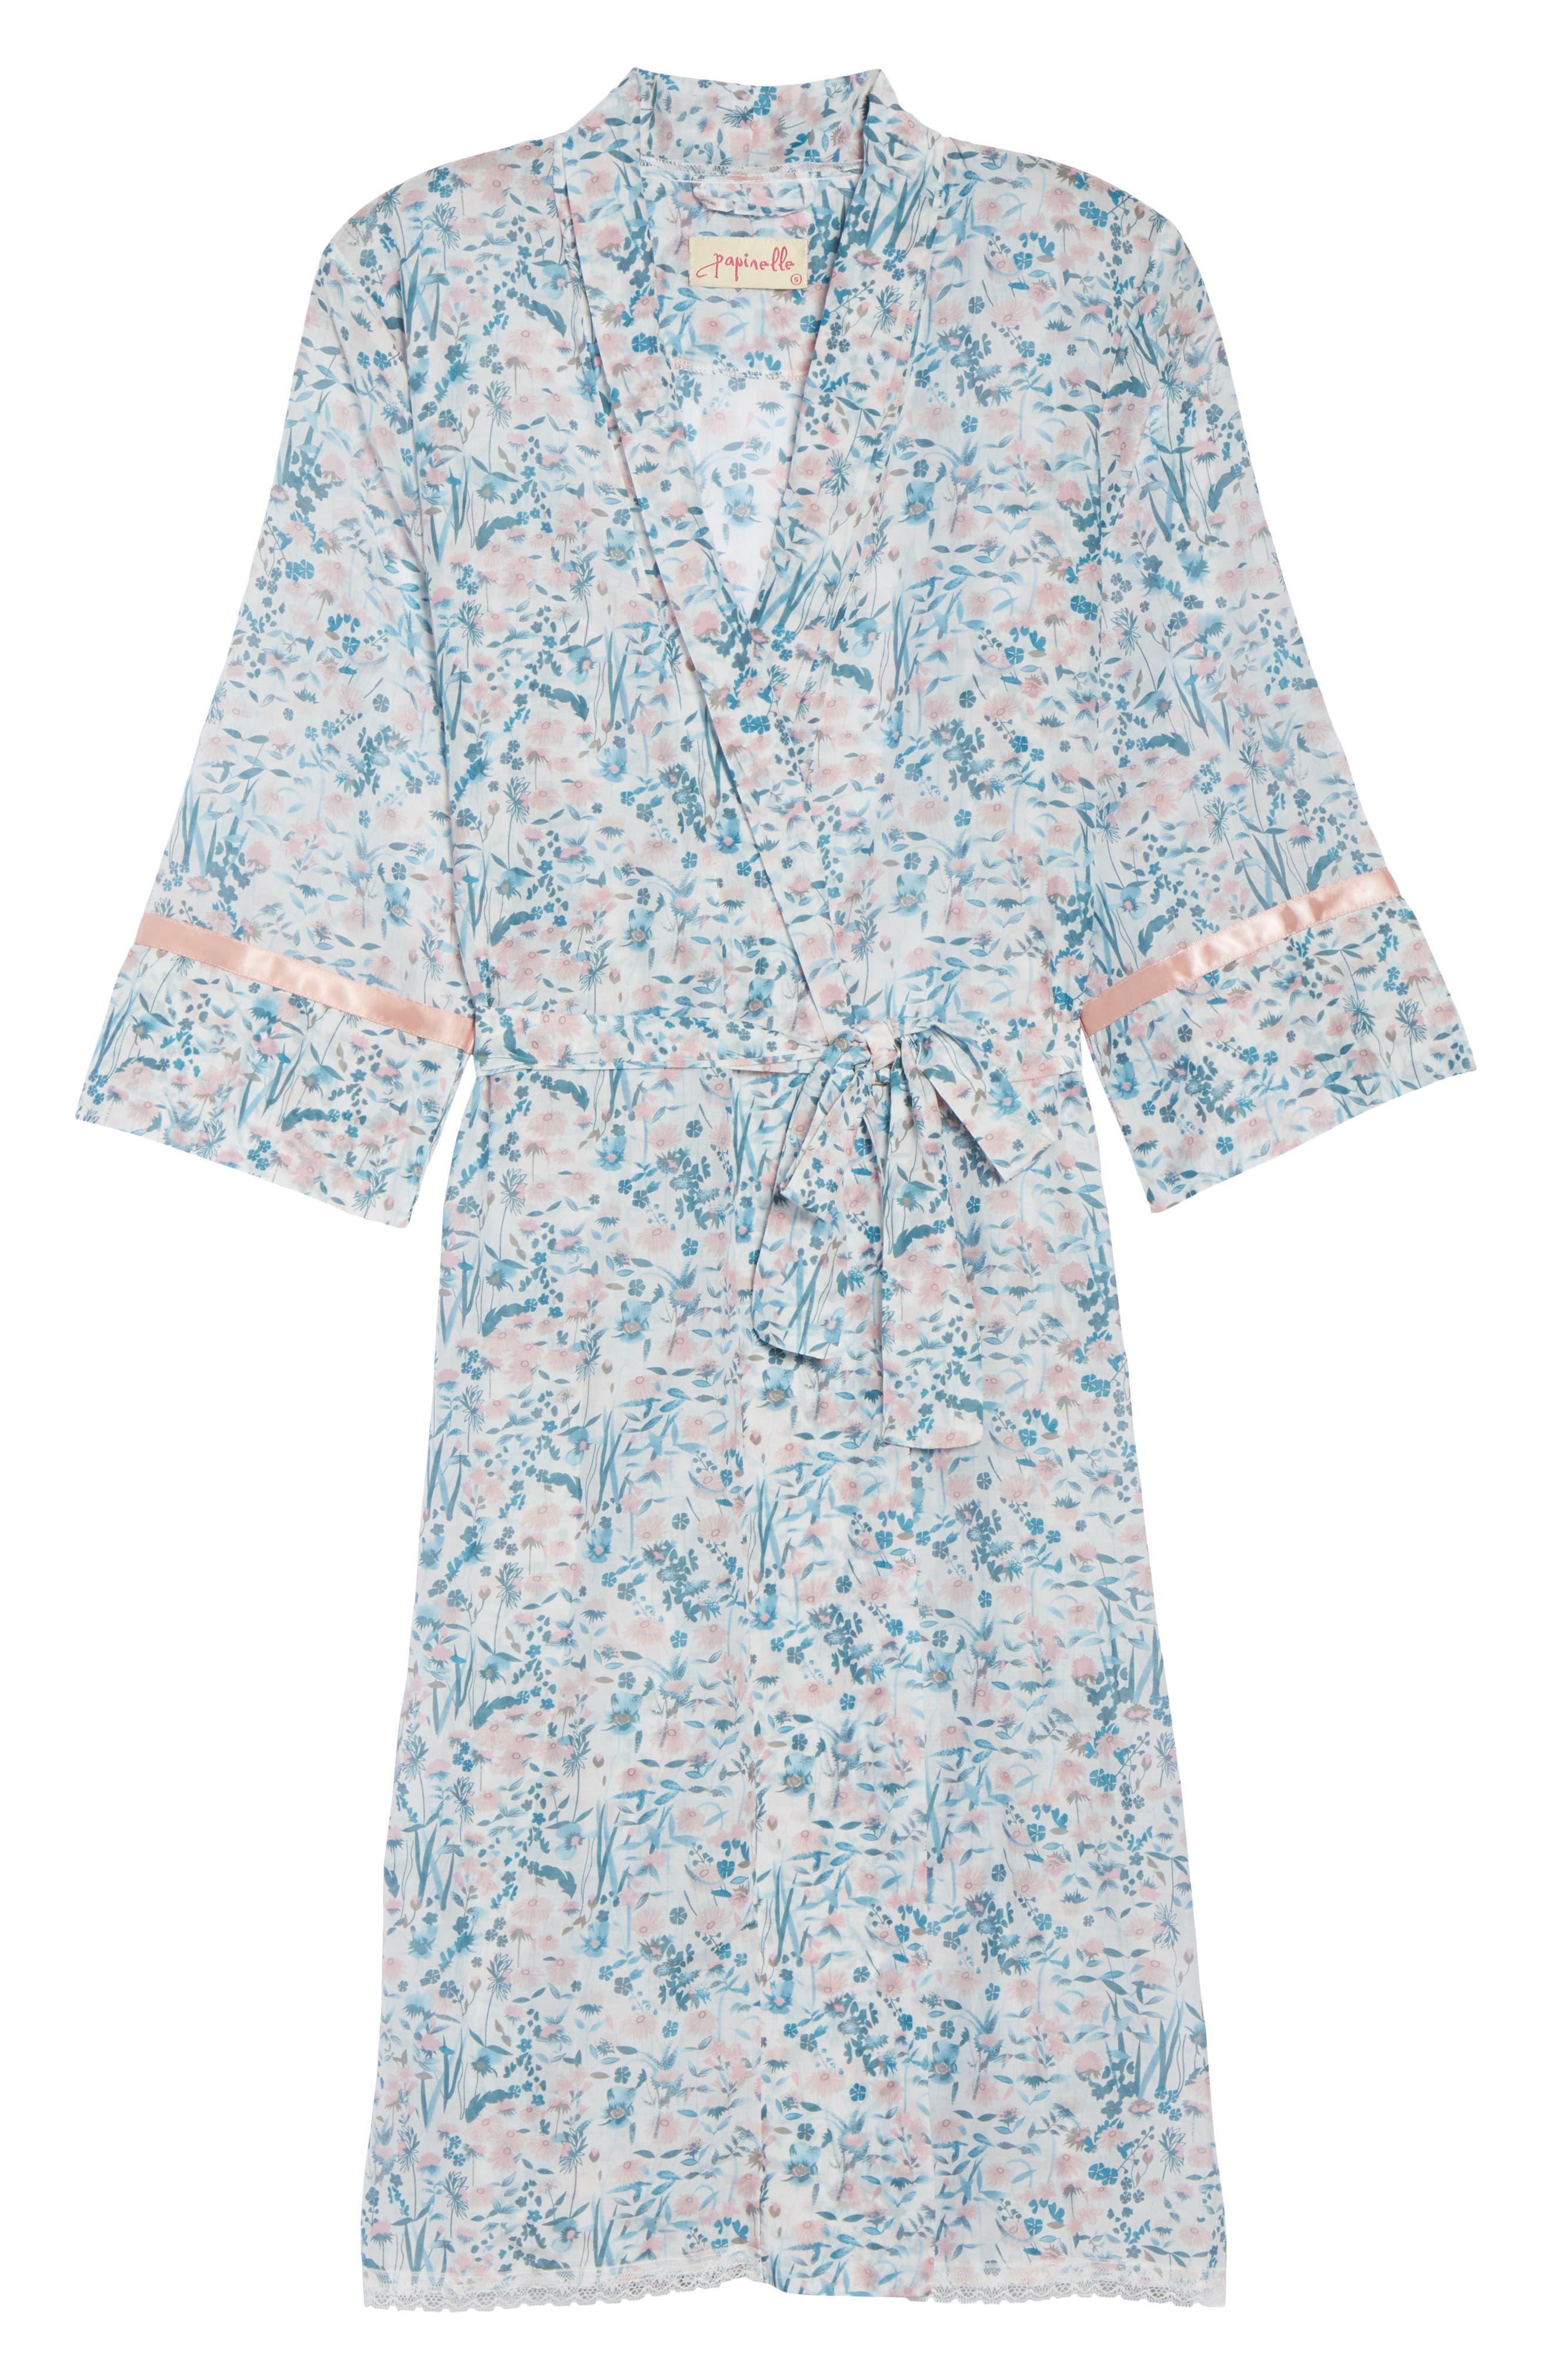 Ellie Floral Robe,                             Alternate thumbnail 6, color,                             BLUE